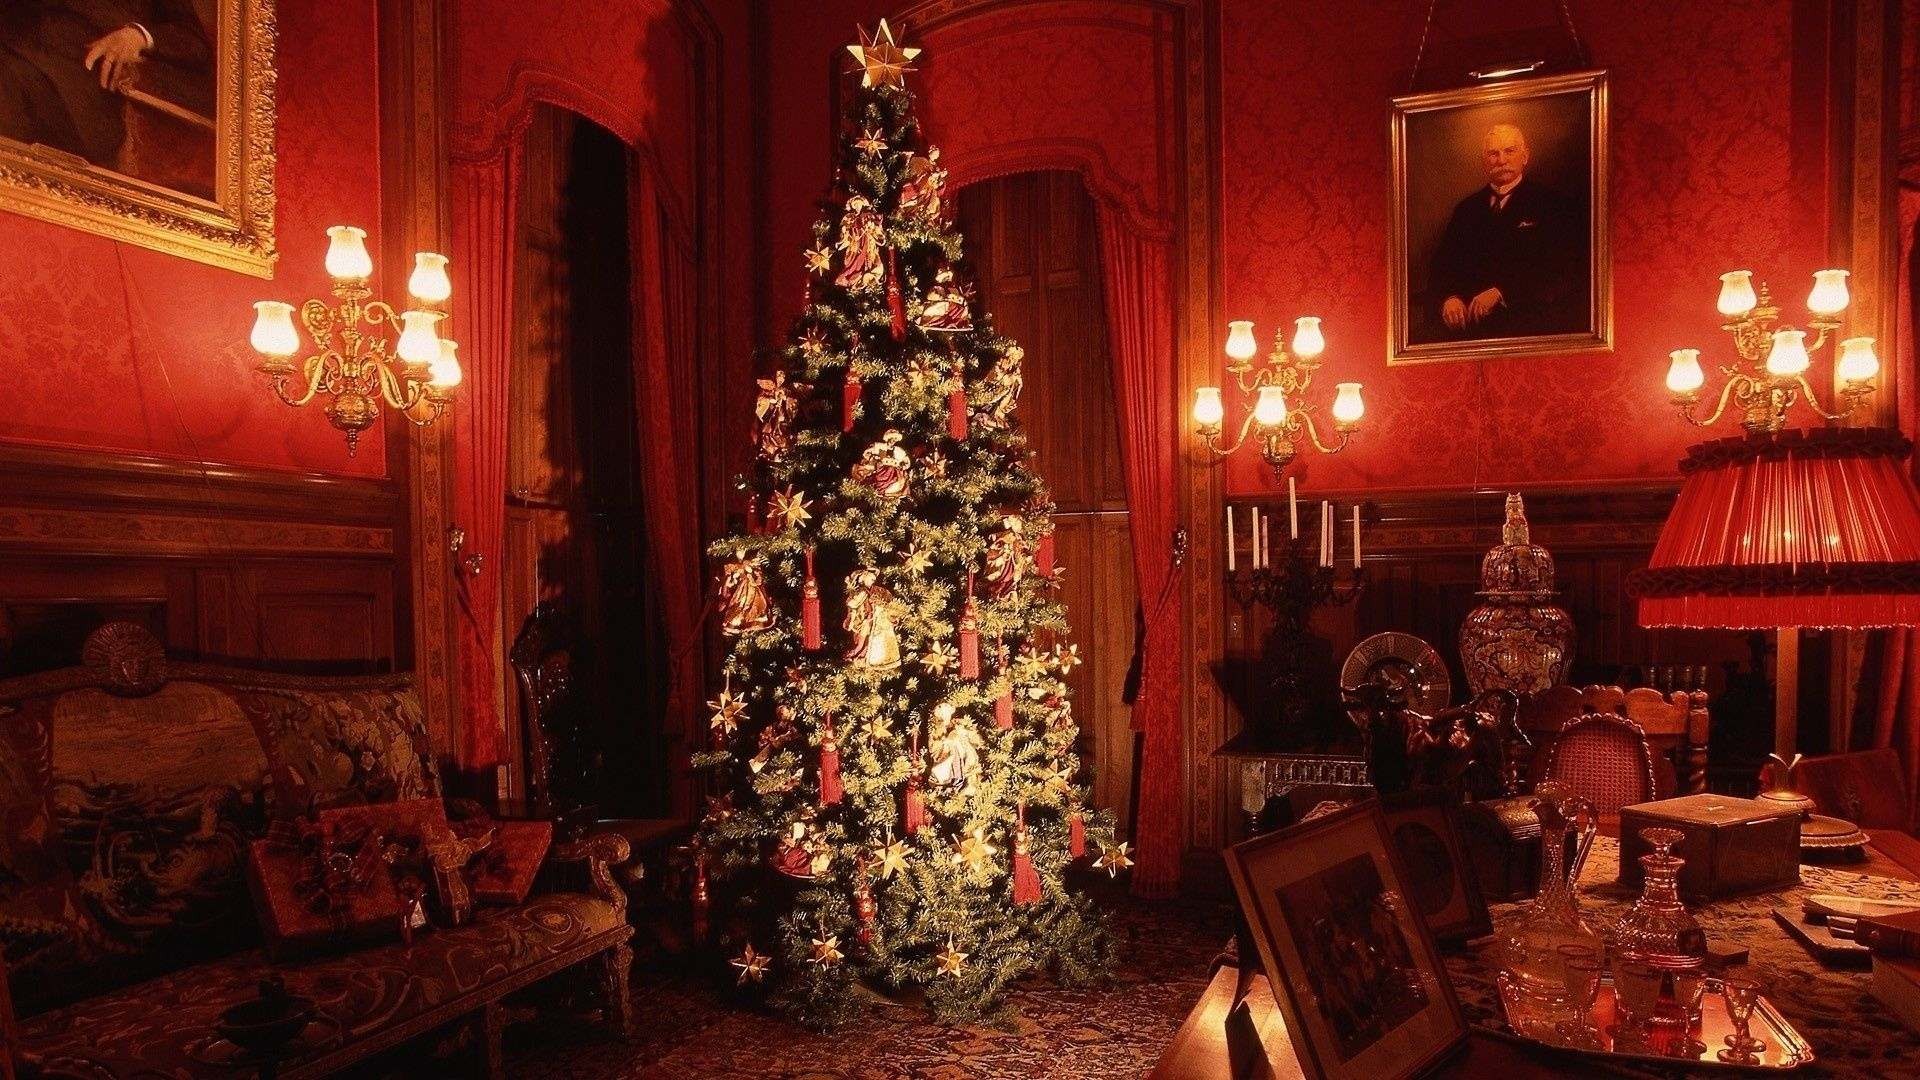 Christmas Fireplace Comfort HD Wallpaper